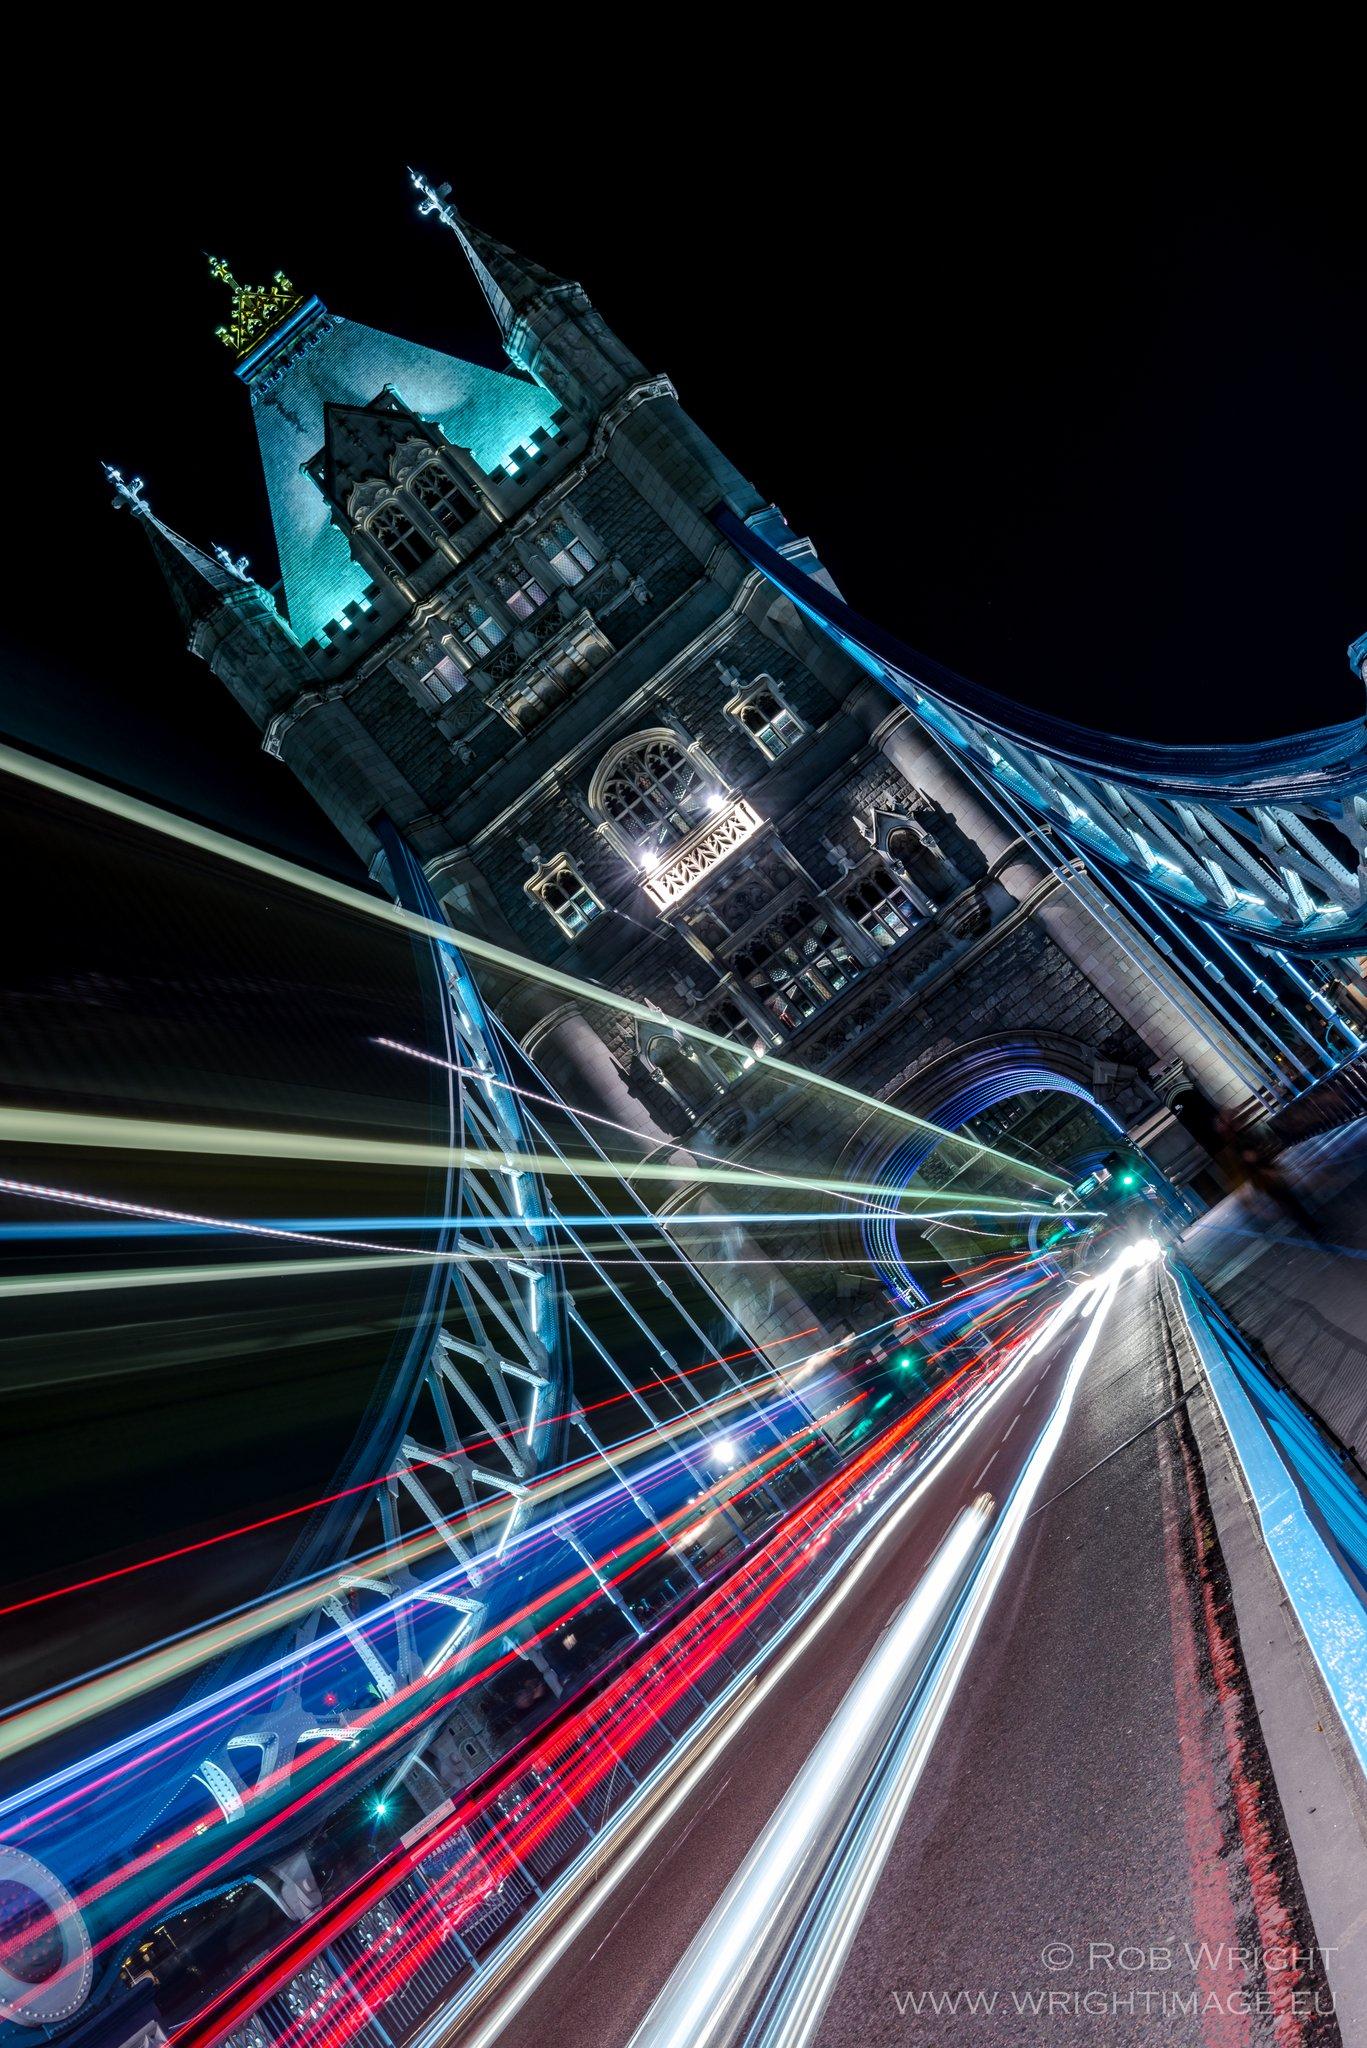 @visitlondon #towerbridge at night. #LondonIn4 https://t.co/jCssNcGT3s